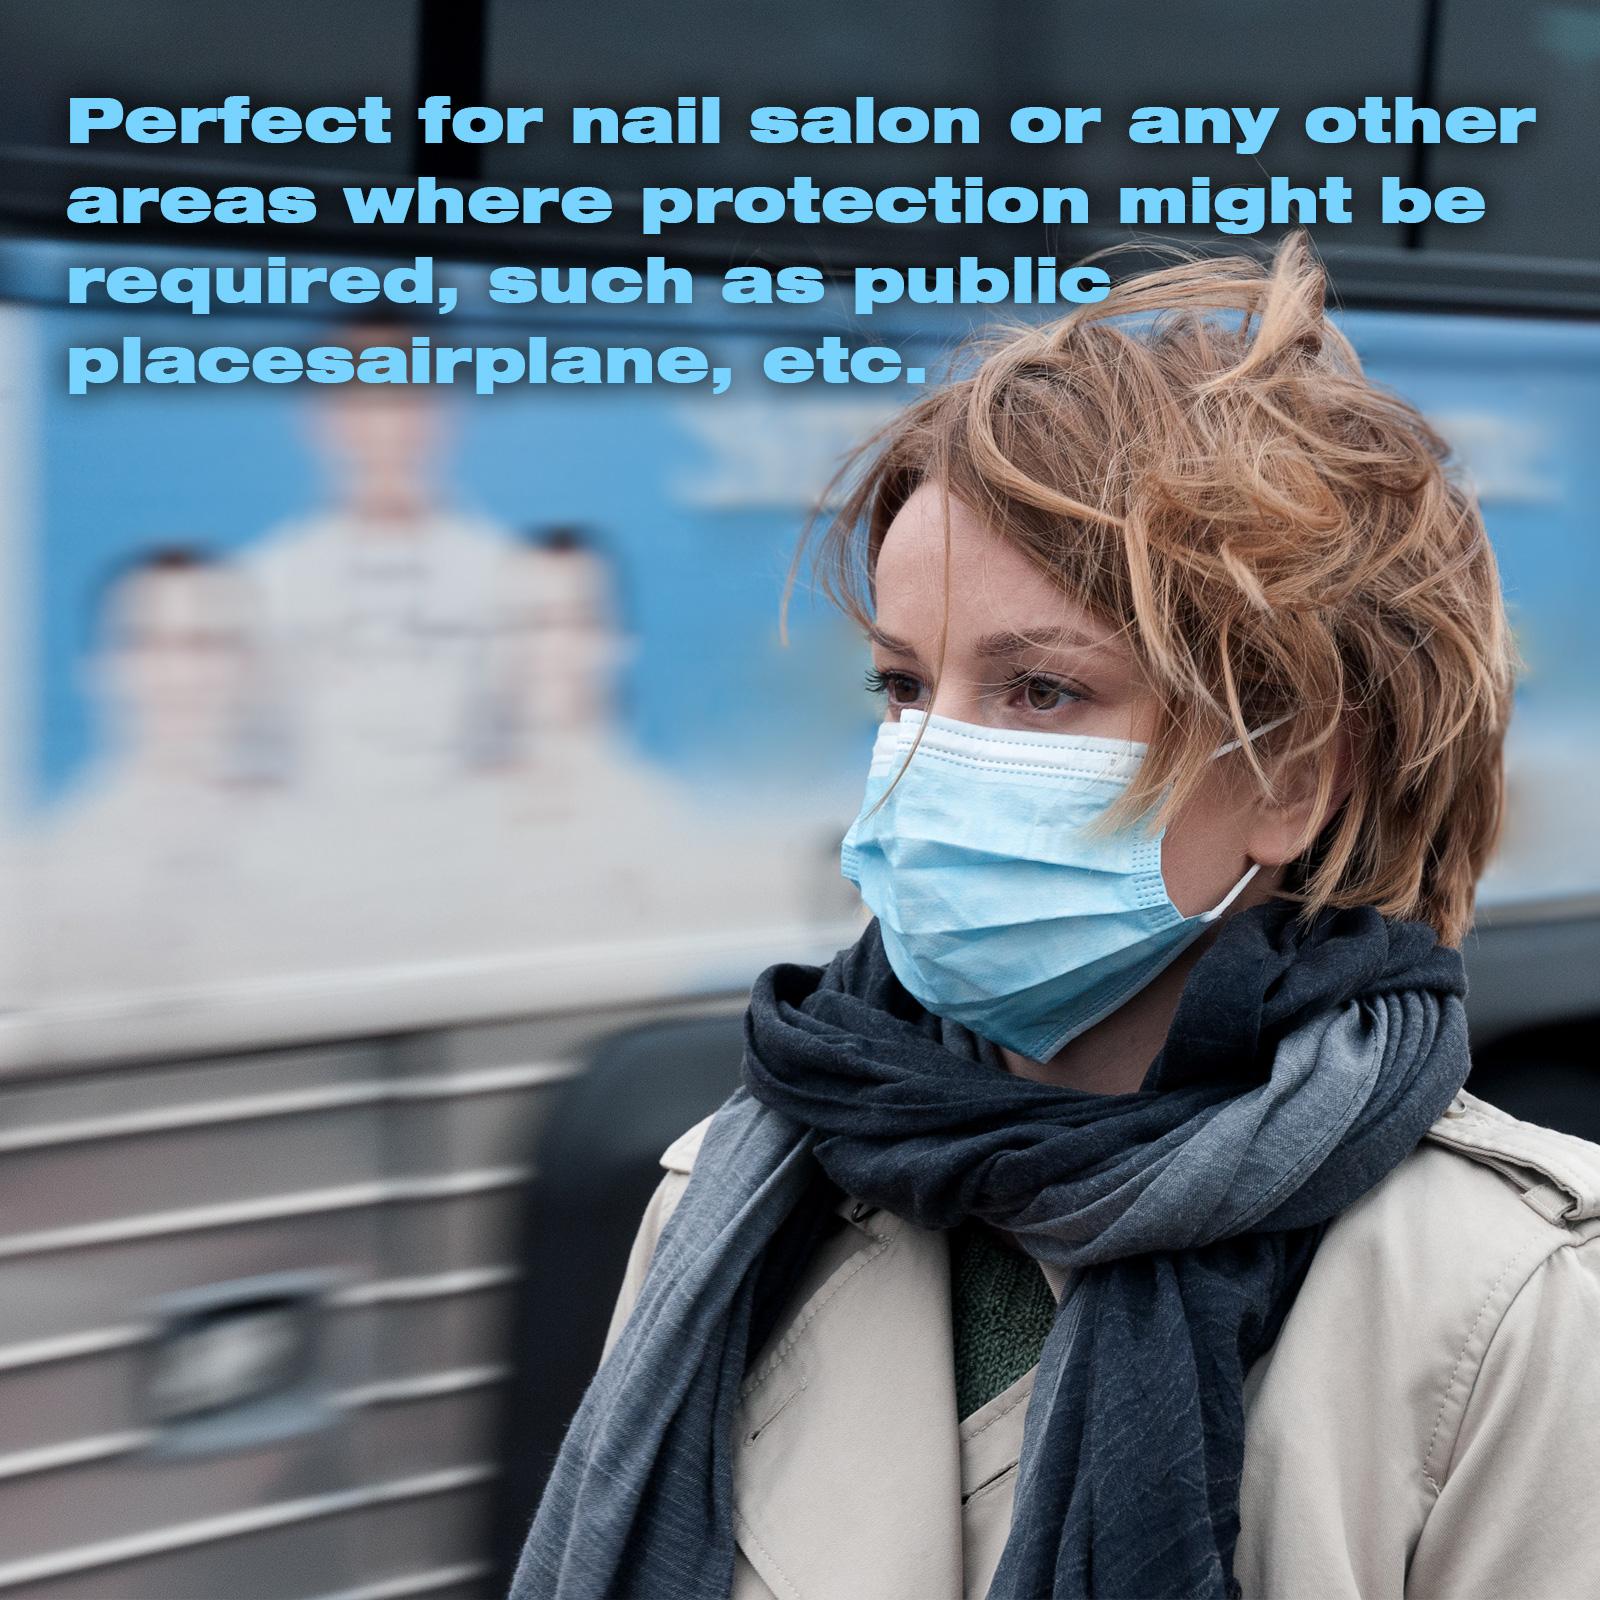 thumbnail 12 - 50/100pcs Disposable Face Mask Protective Mouth Masks 3 Layer Meltblown Filter